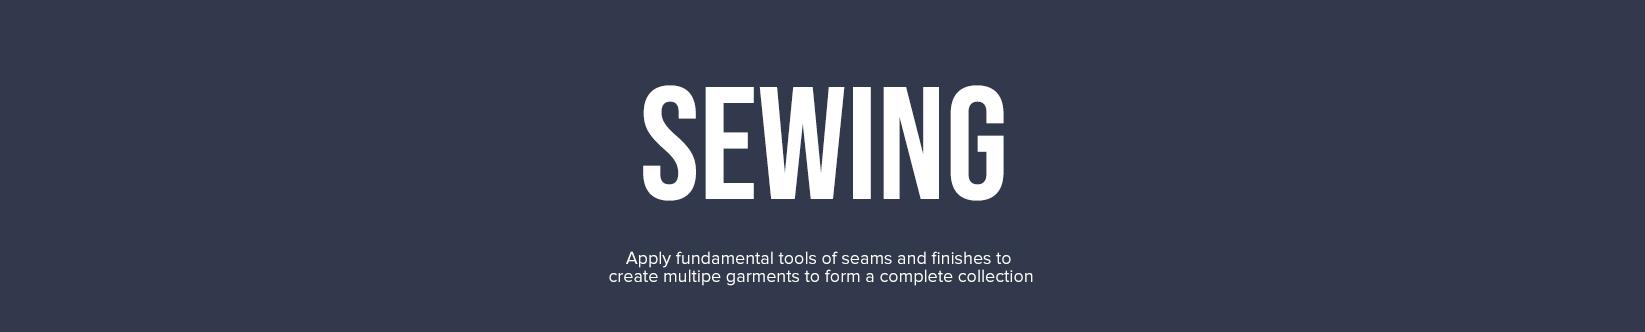 Page-Header-NEW-Sewing (1).jpg